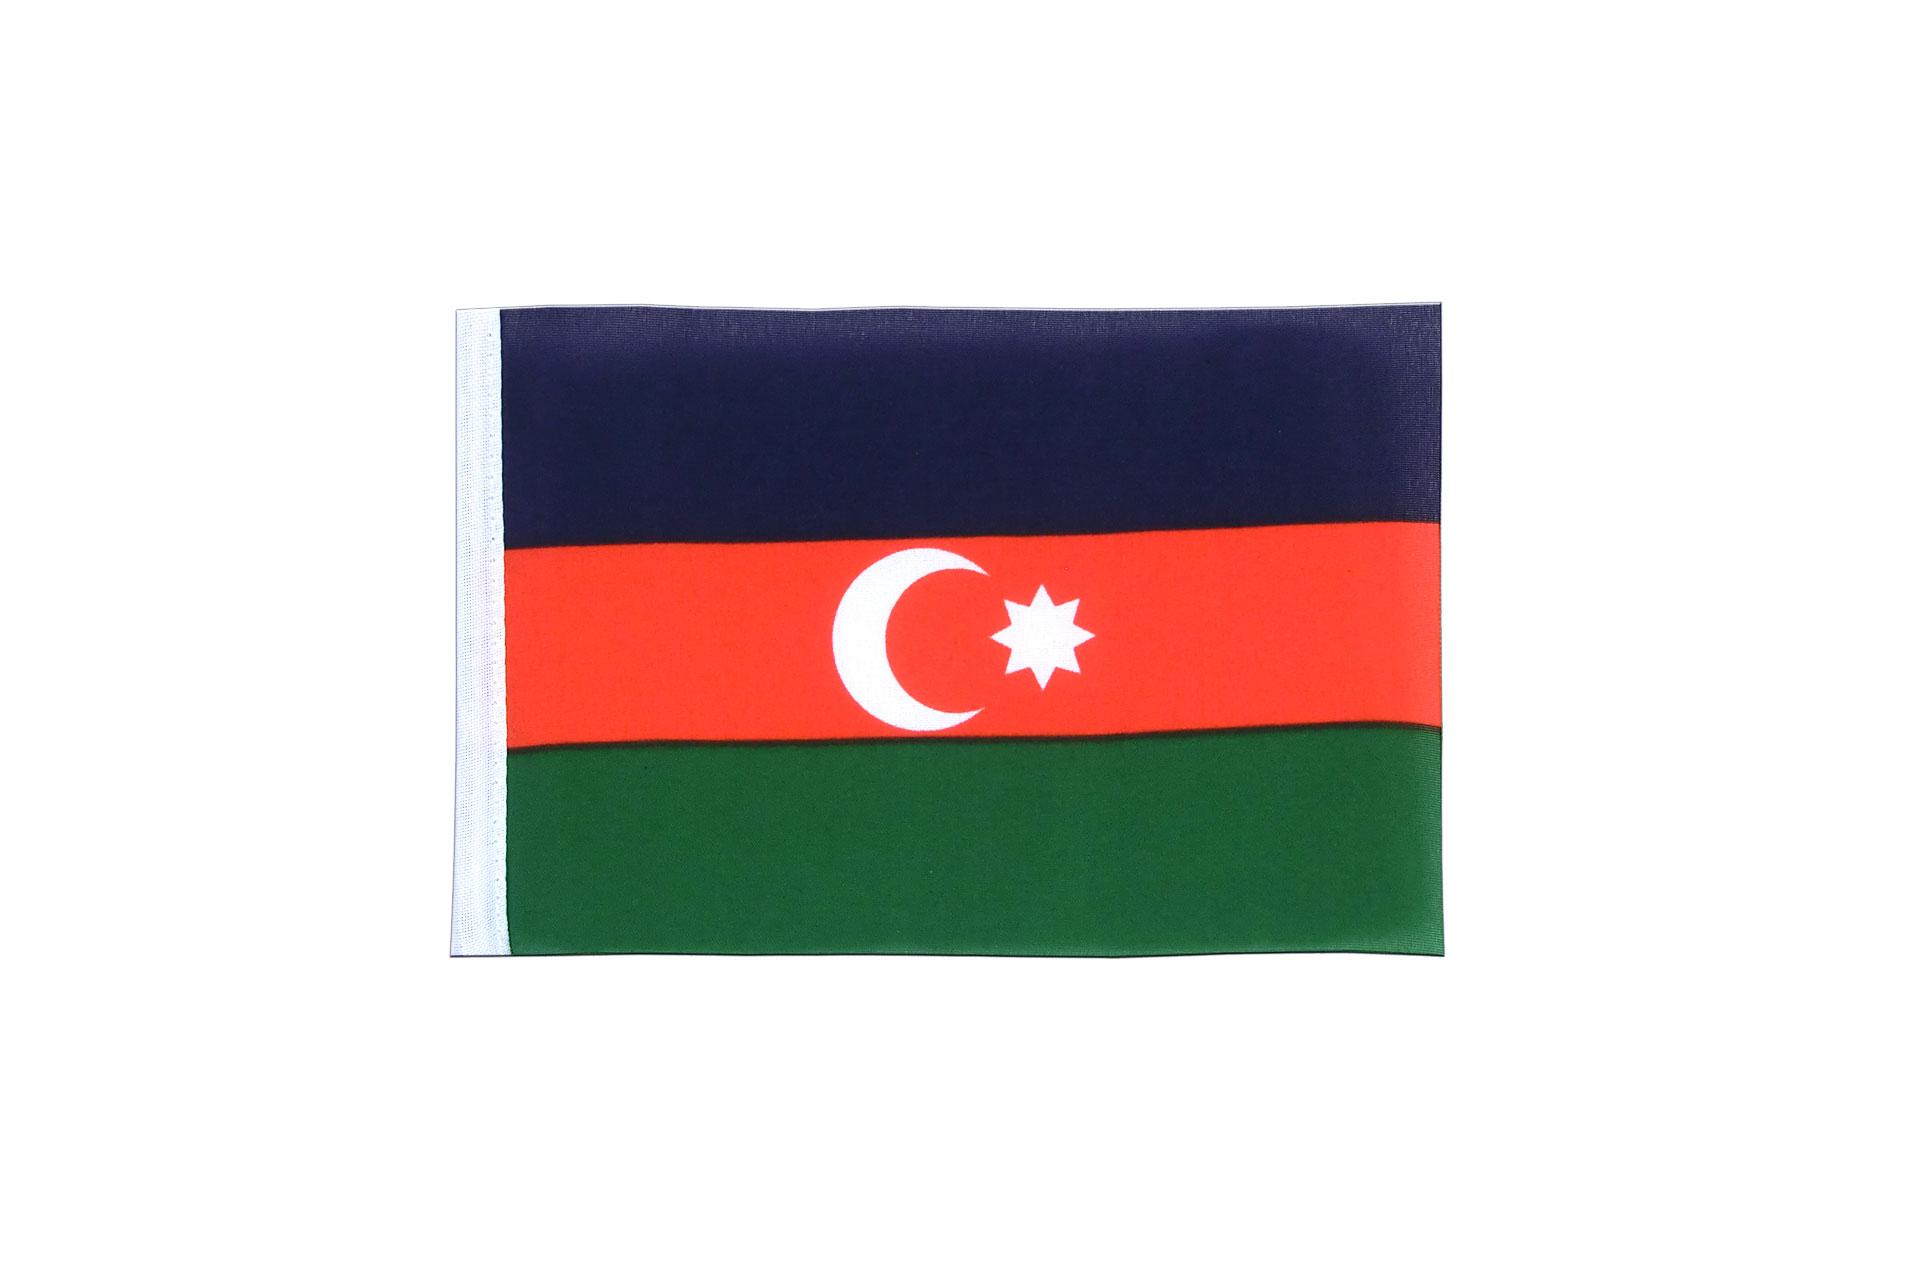 30 x 40 cm Fahne Flagge 10 x Türkei Auto Fahne Autoflagge